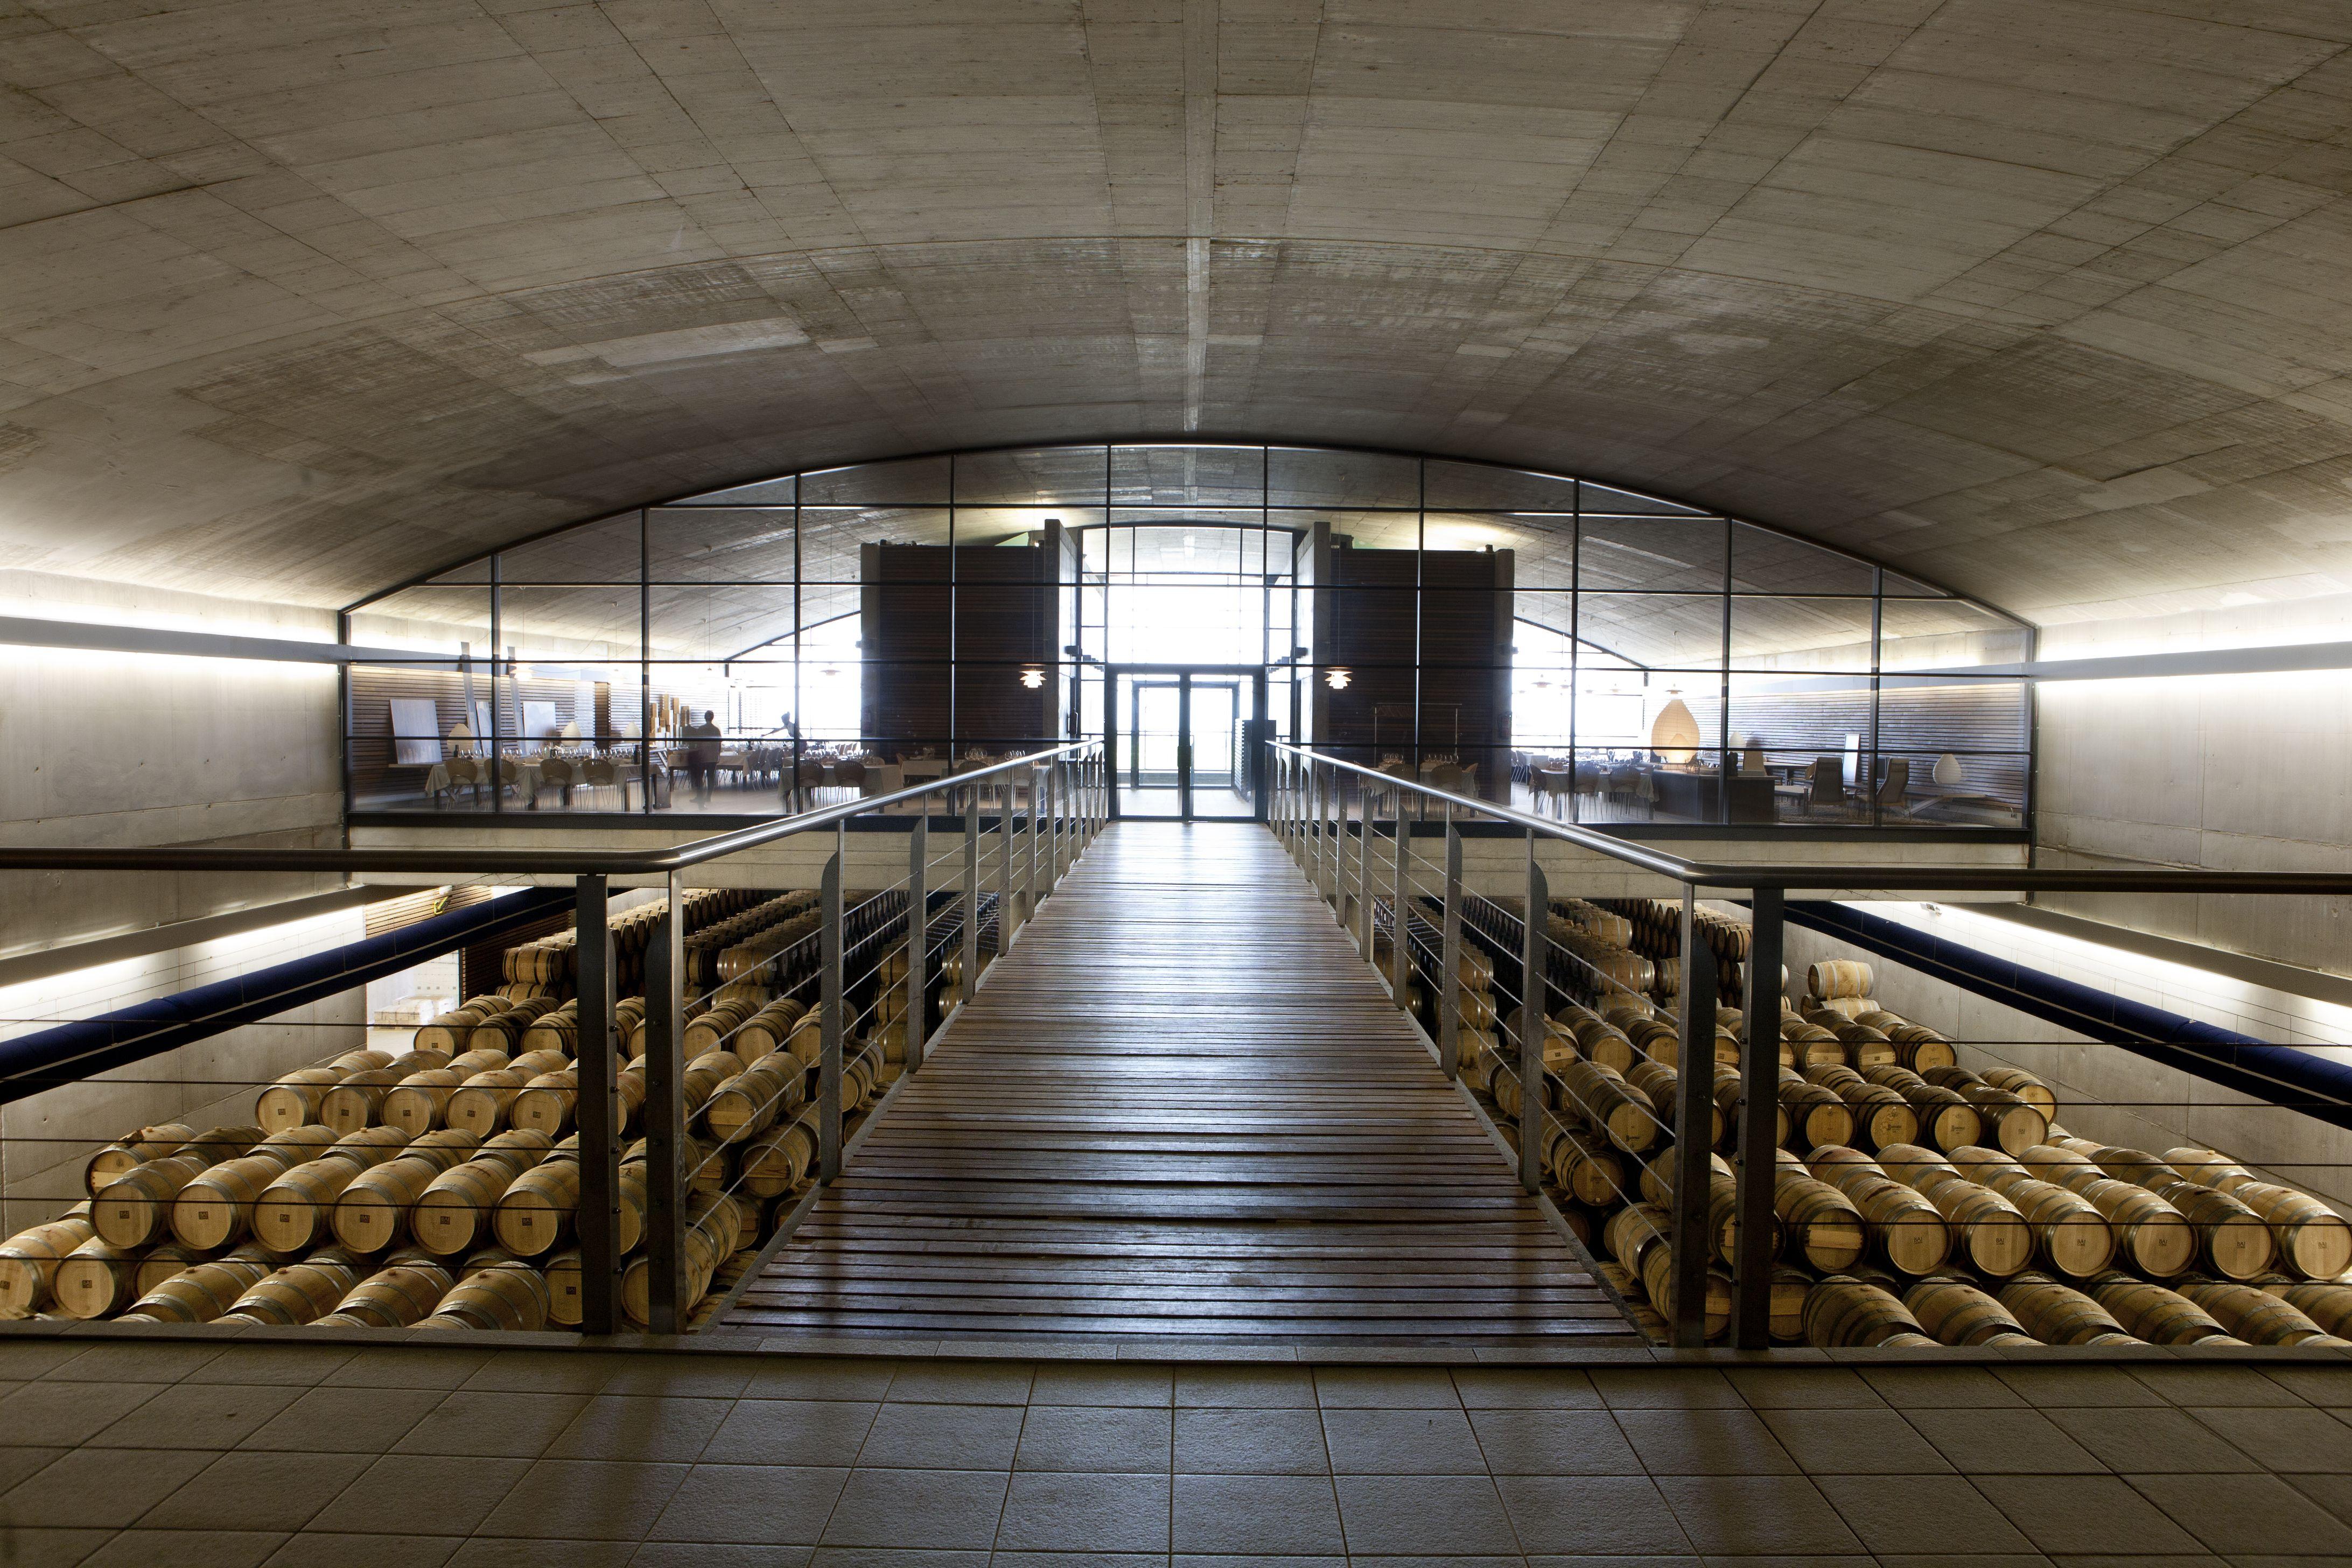 I Aki Aspiazu Iza Arquitectura Bodega Baigorri Samaniego  # Muebles Baigorri